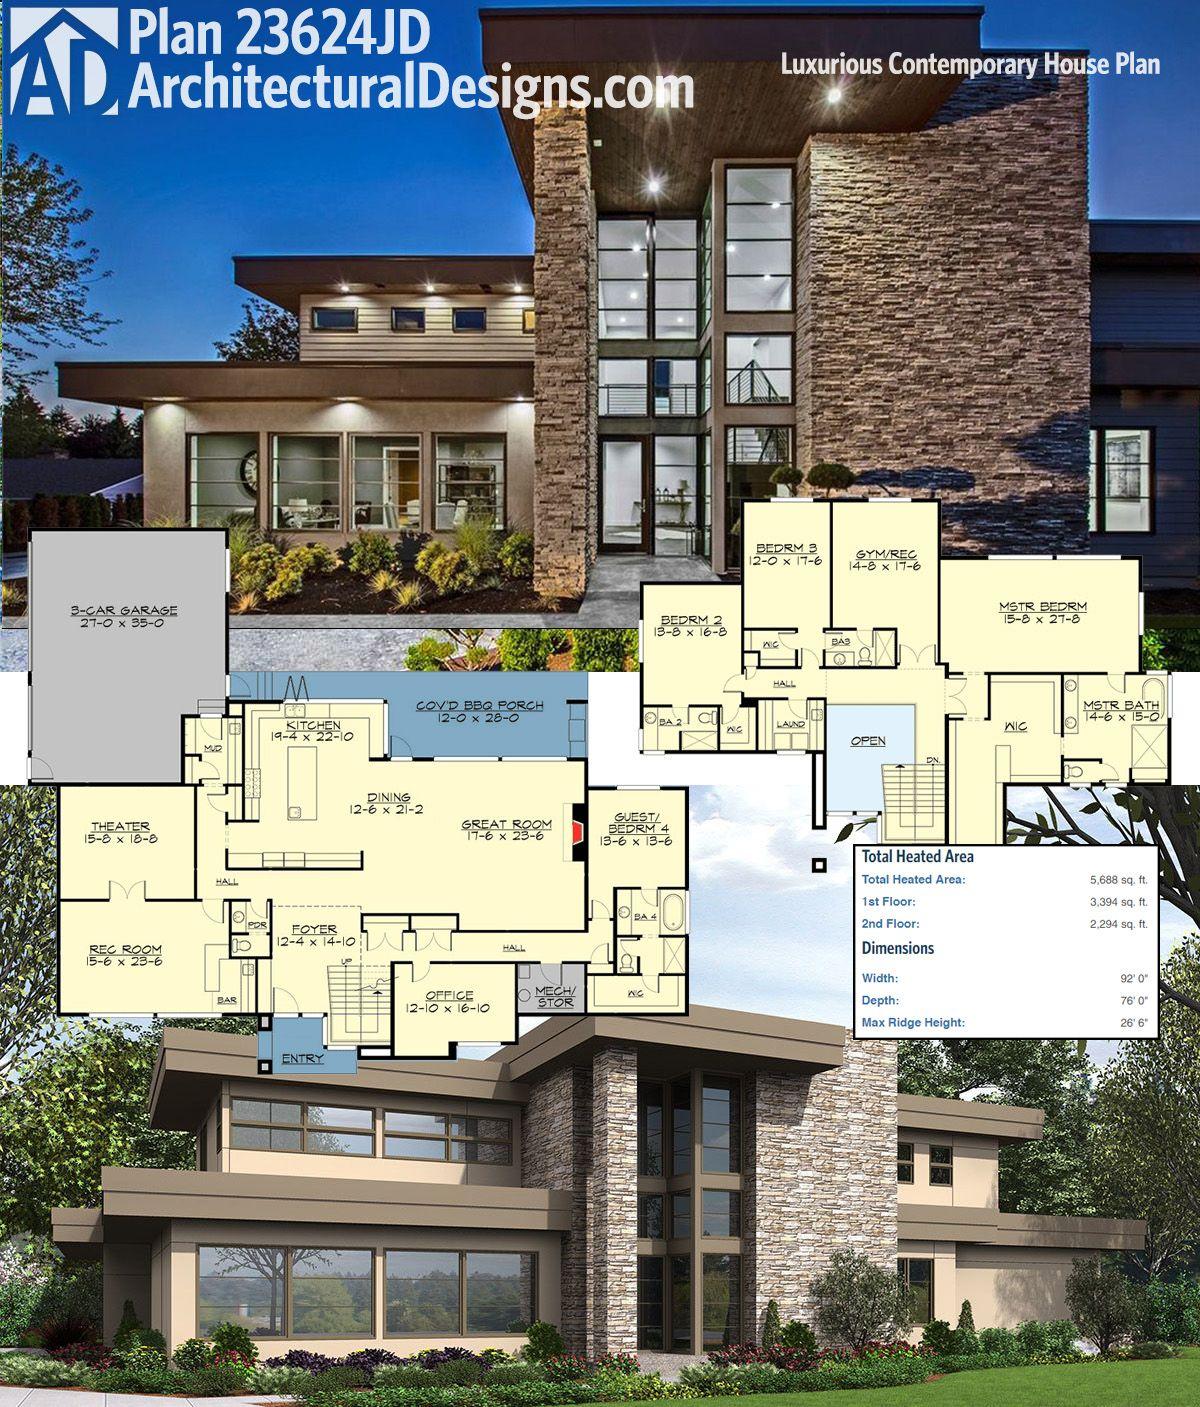 Plan 23624jd Luxurious Contemporary House Plan